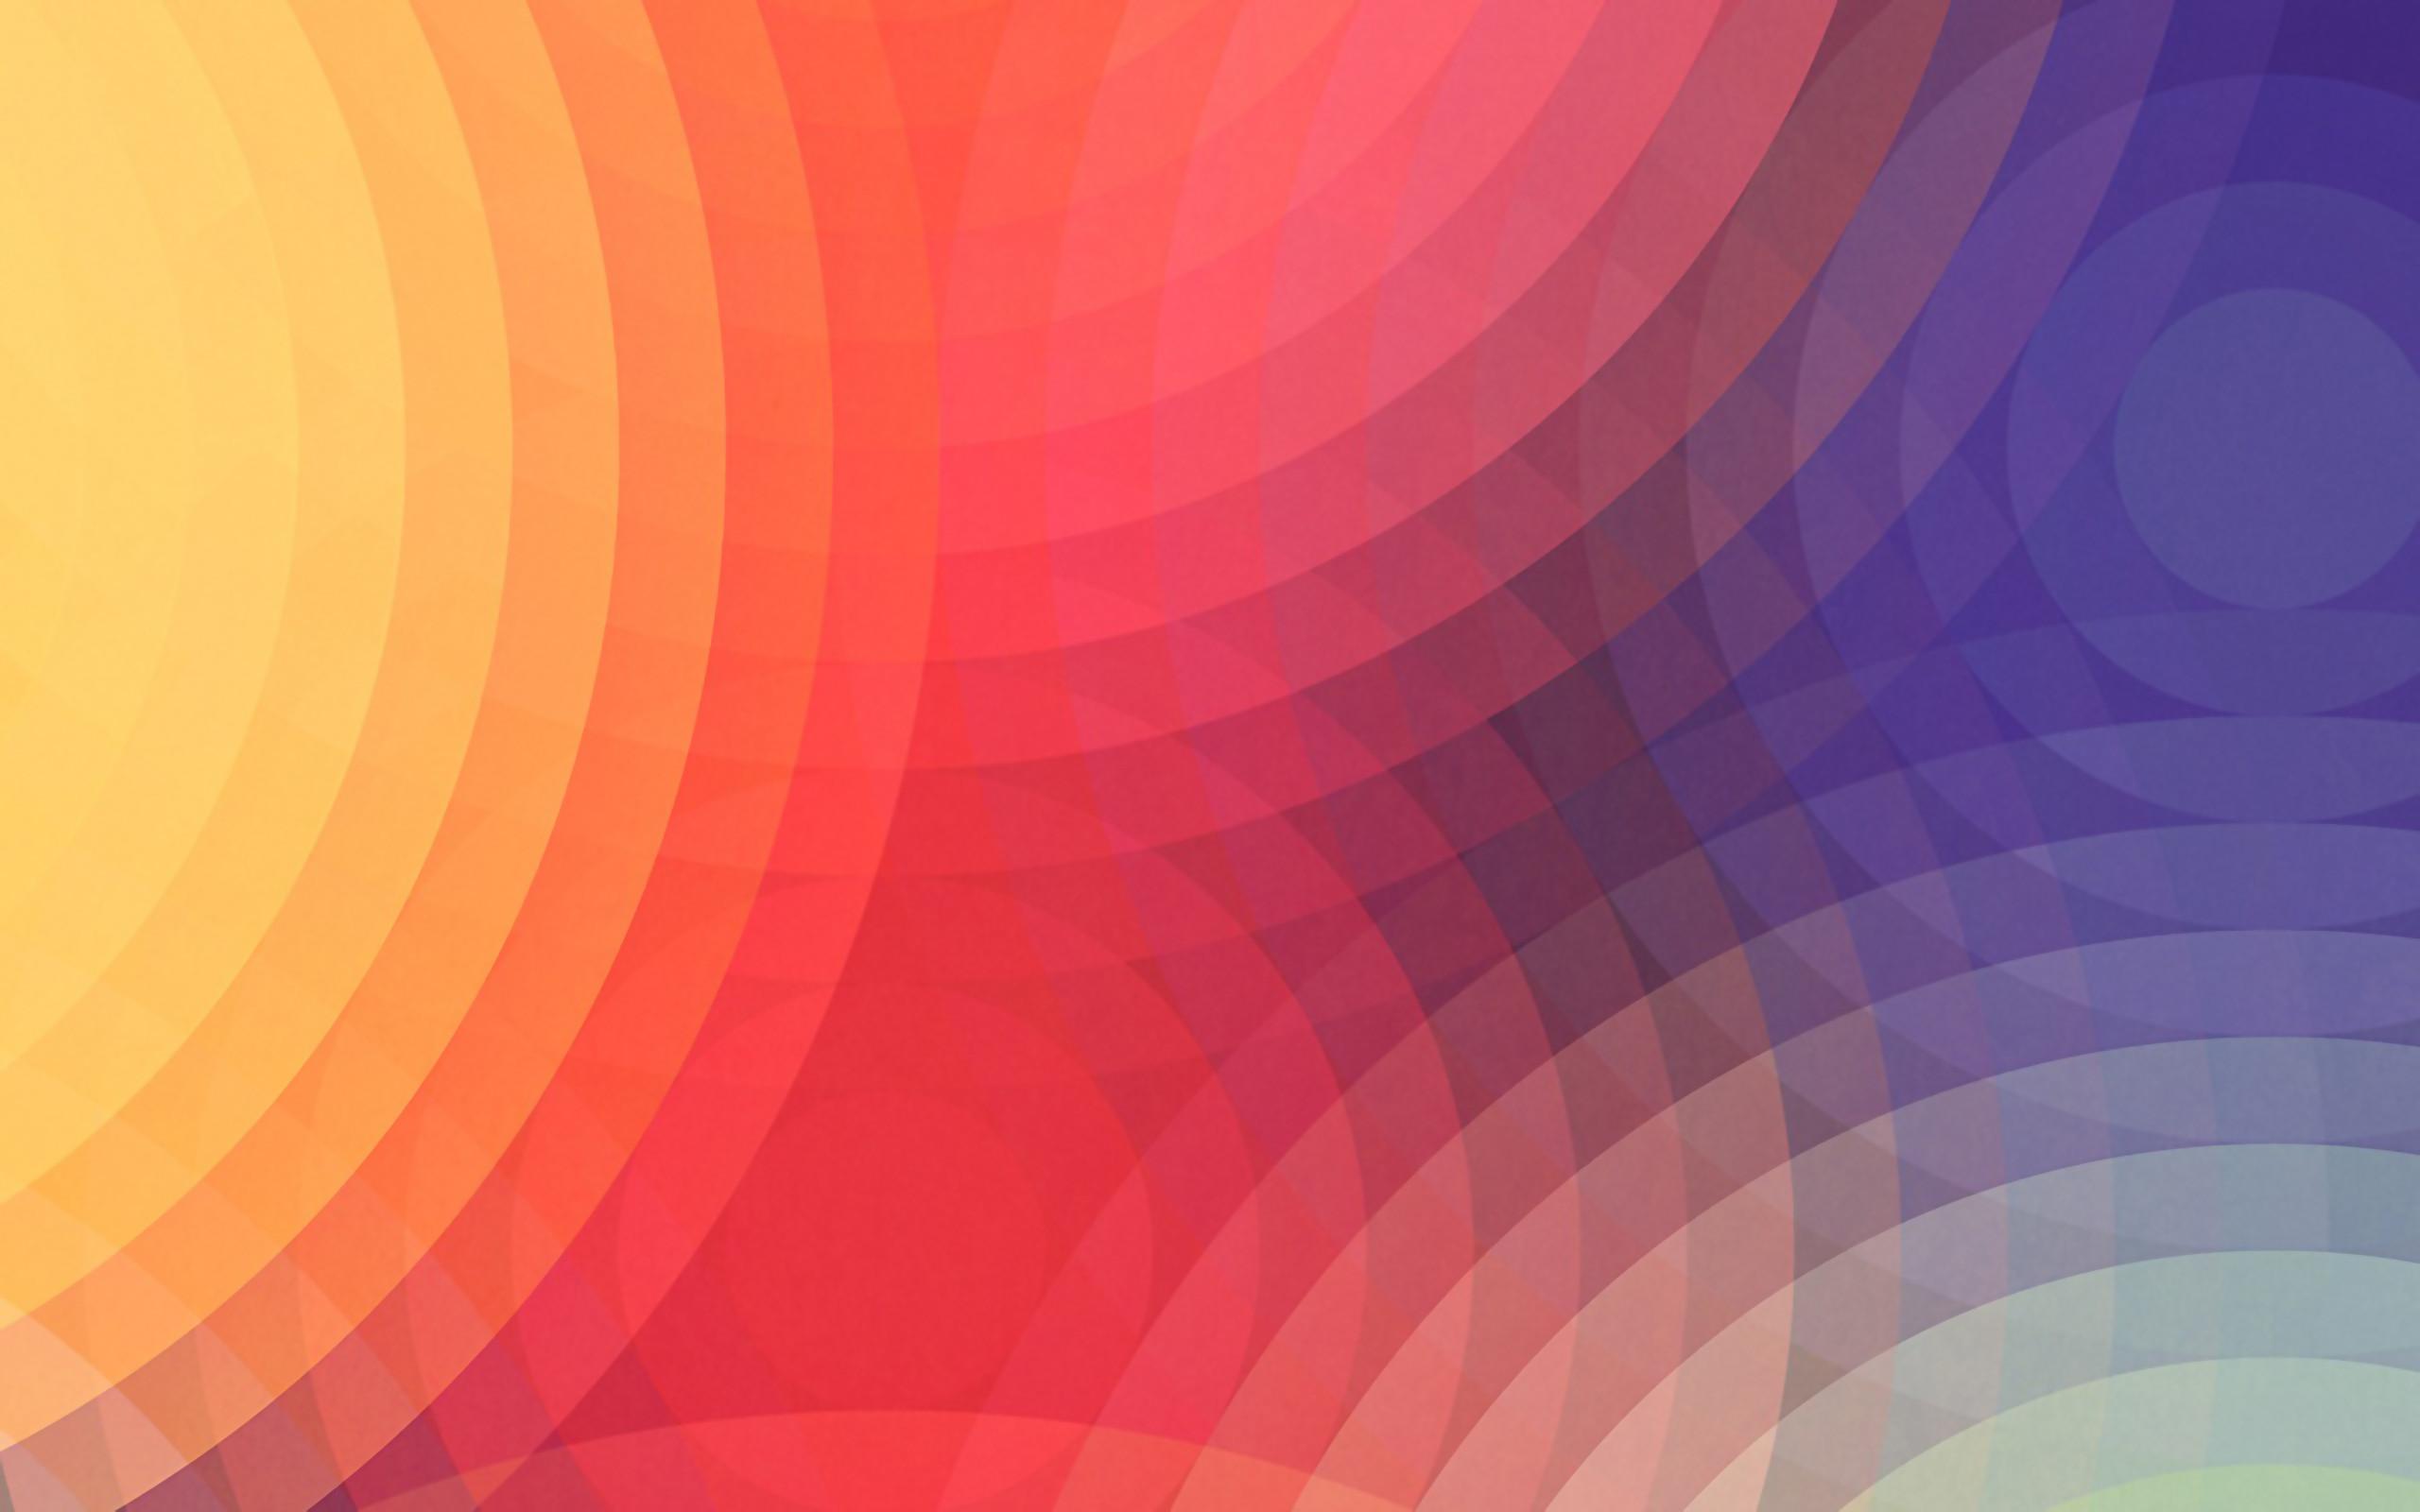 Cool Geometric Wallpaper (74+ Images